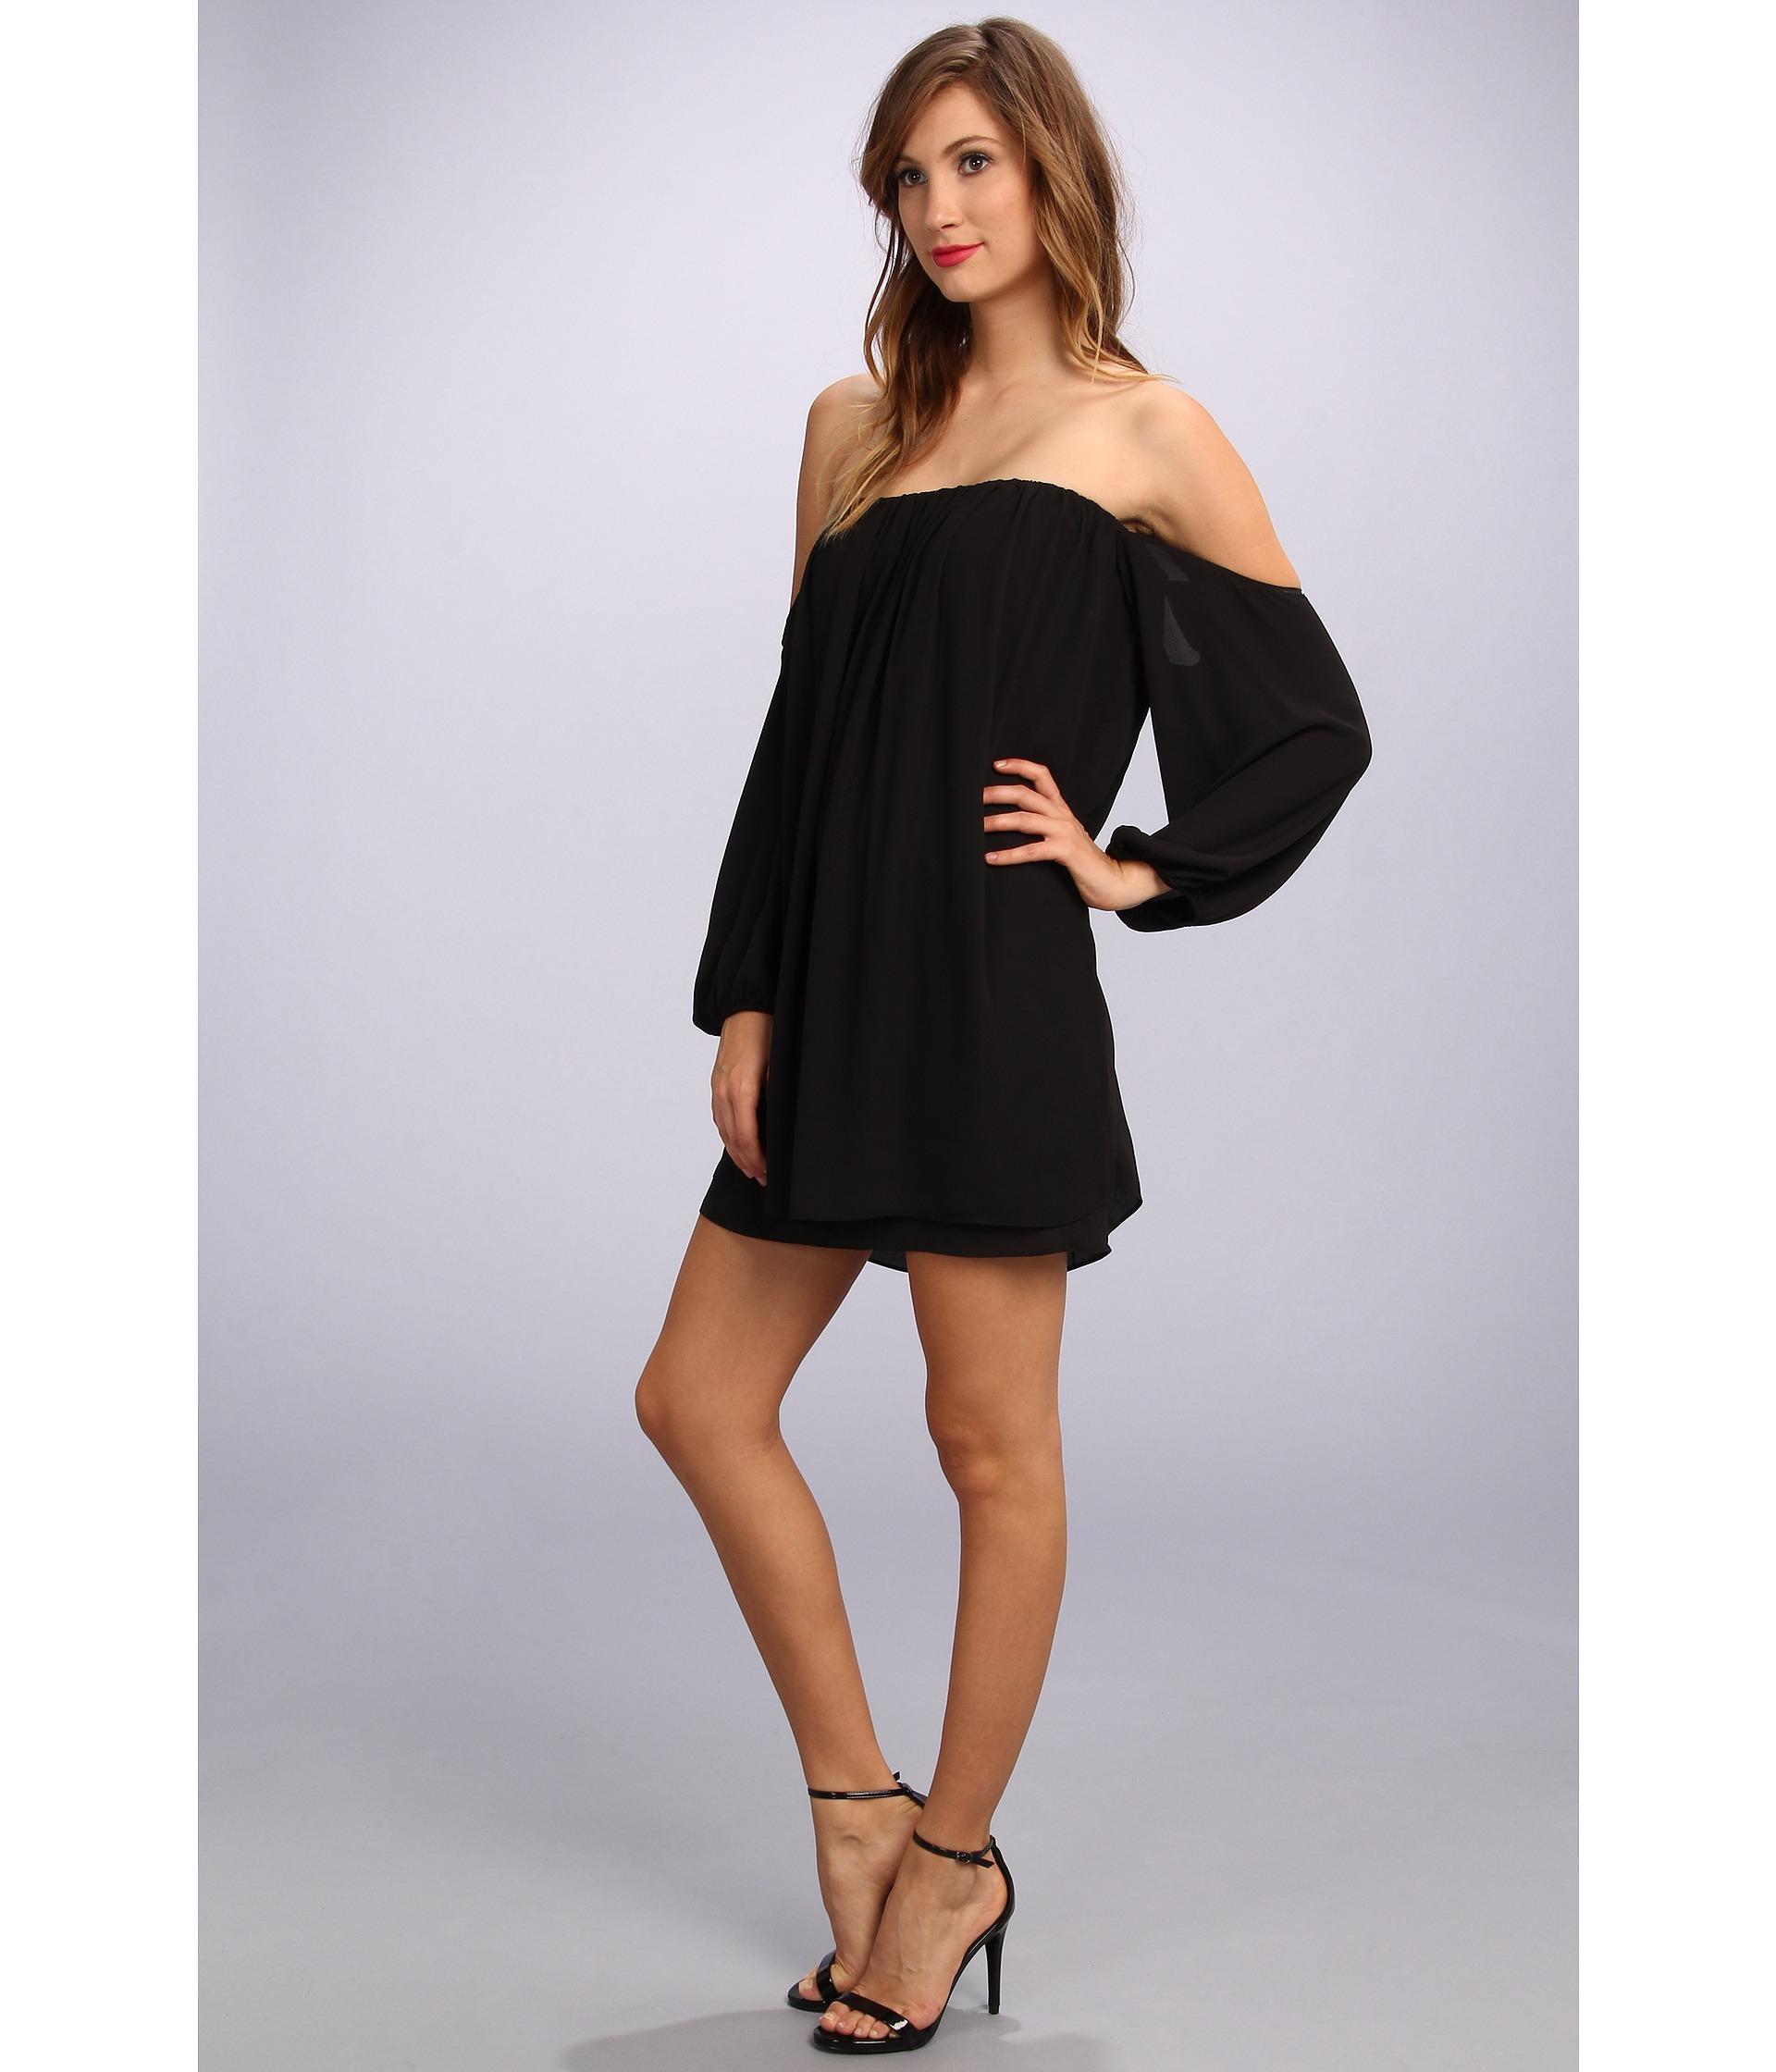 df3690ce3794 Lyst - T-bags Chiffon Off Shoulder Sleeve Mini Dress in Black